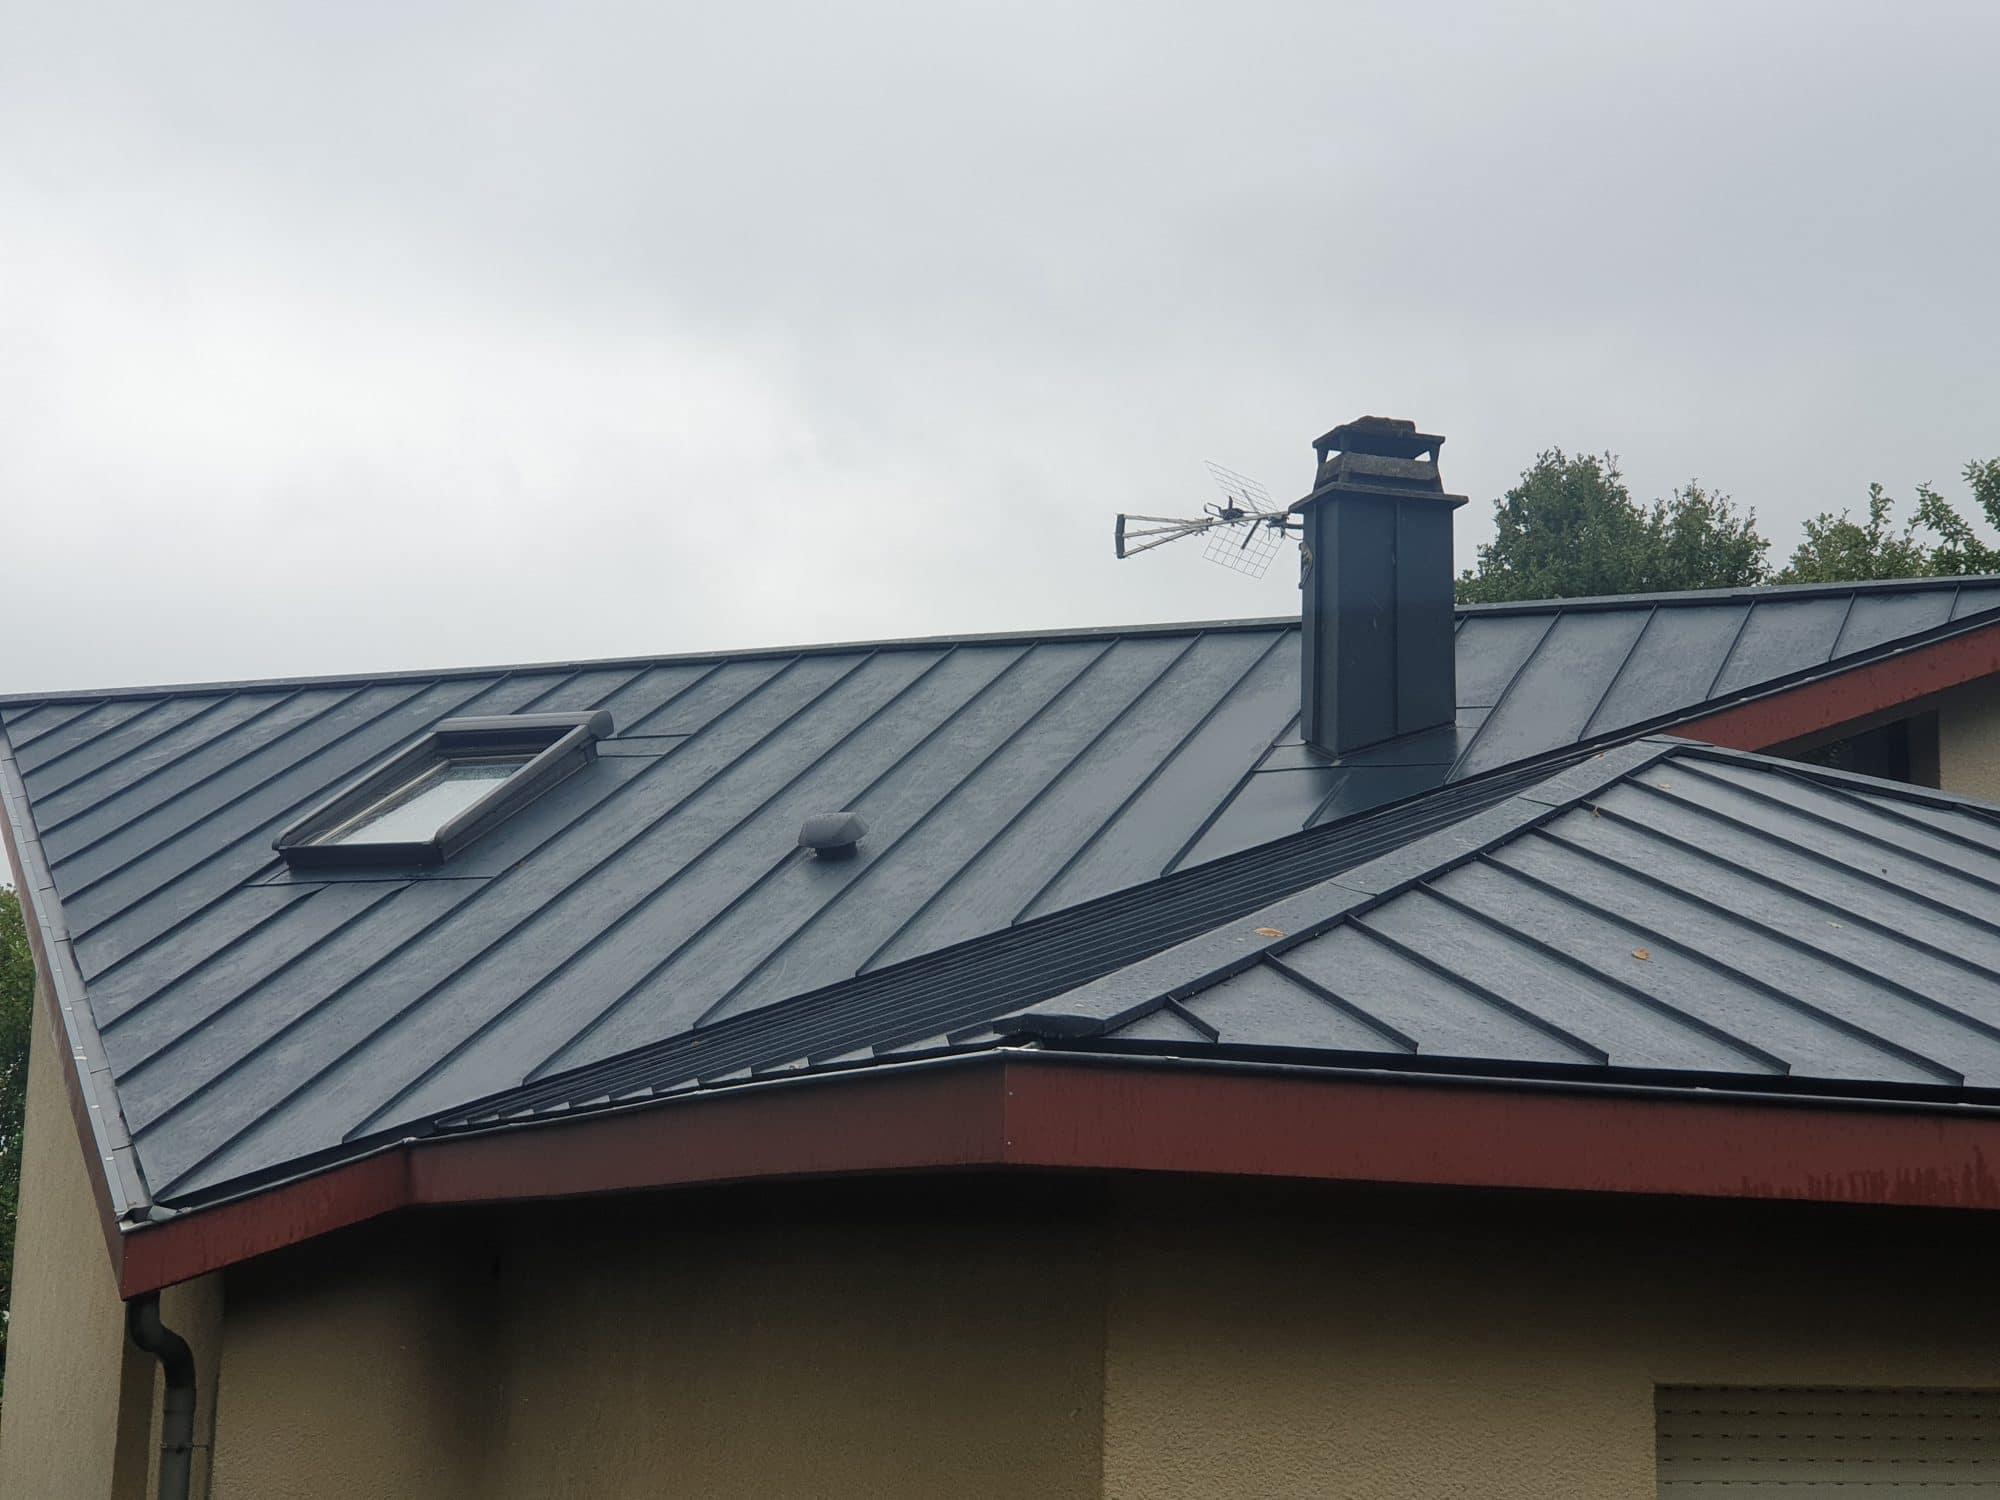 Rénovation toit en bardeau / shingle à Figeac | Toiture Alu 46